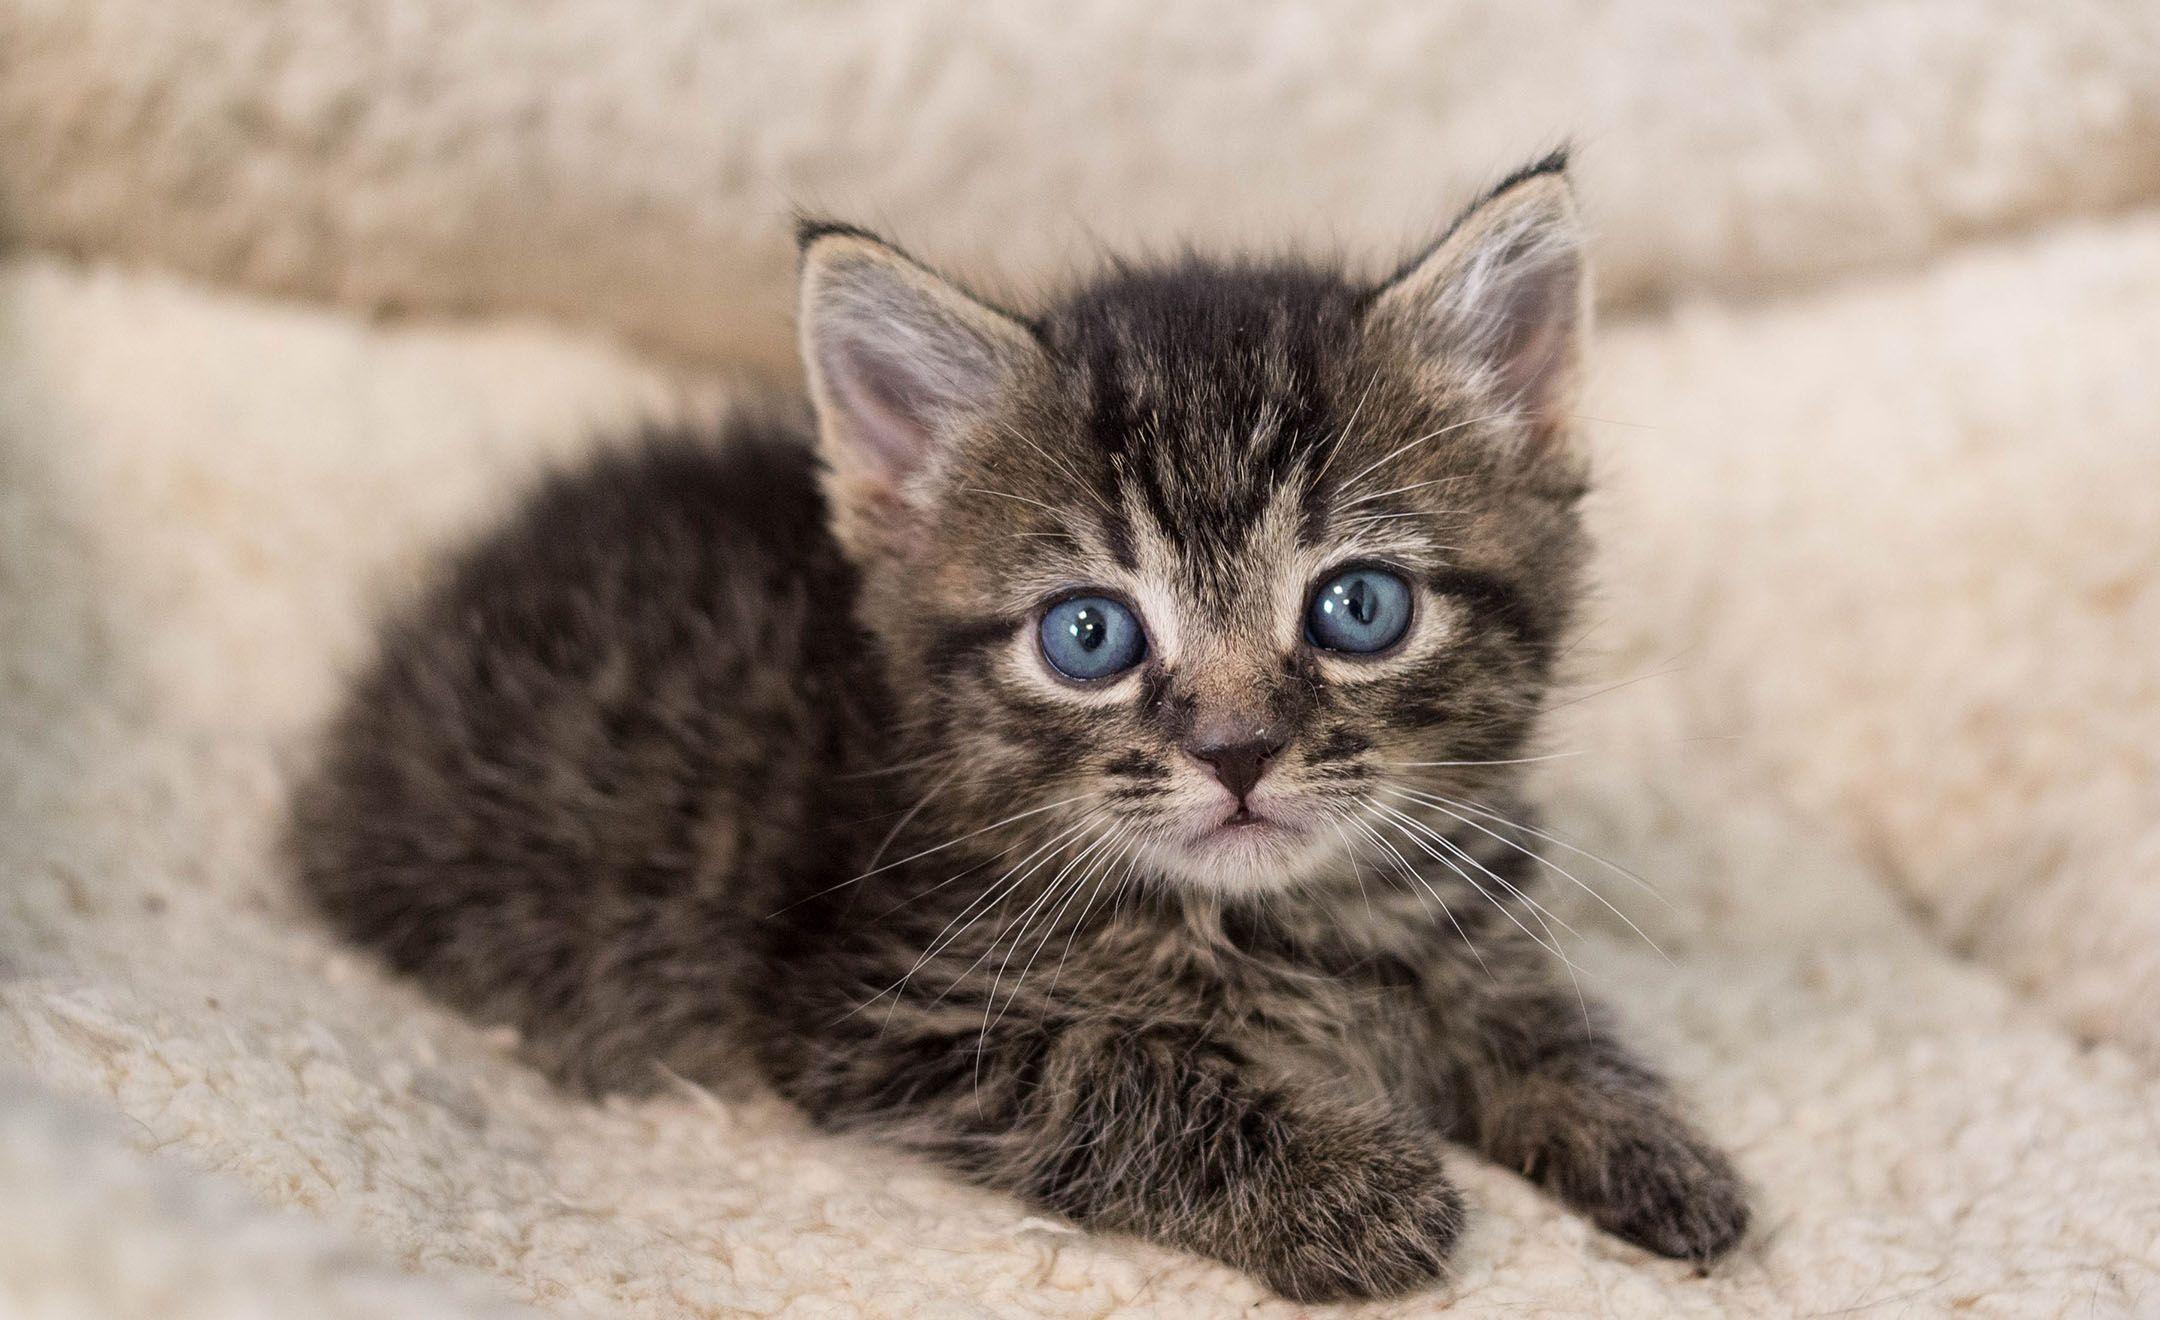 Kitten Lady Neonatal Kitten Rescue And Advocacy Learn More